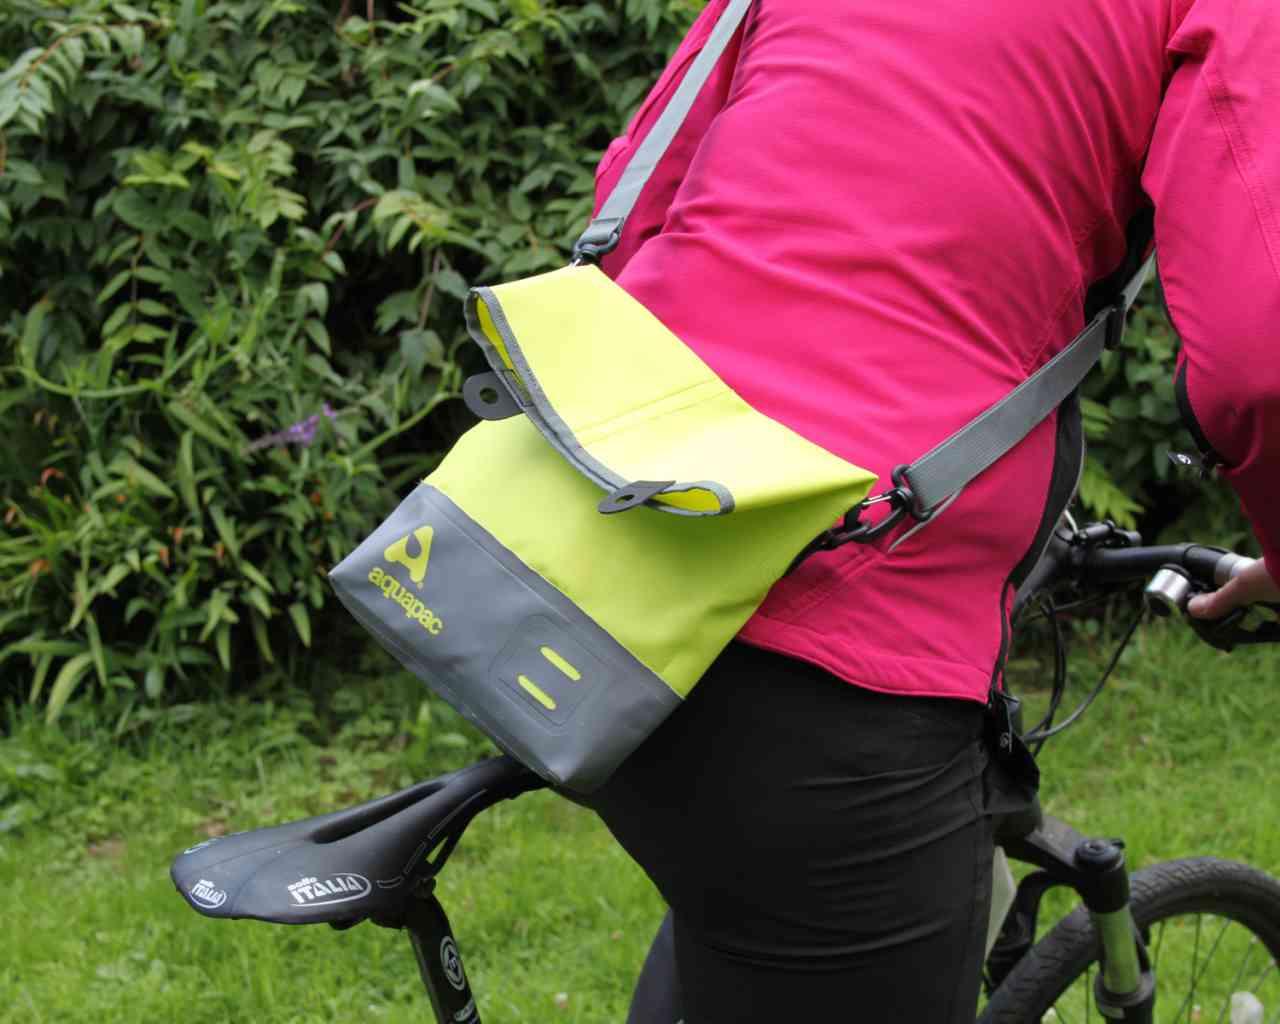 Брызгозащитная сумка Aquapac 051 - TrailProof™ Tote Bag – Small.. Aquapac - №1 в мире водонепроницаемых чехлов и сумок. Фото 4